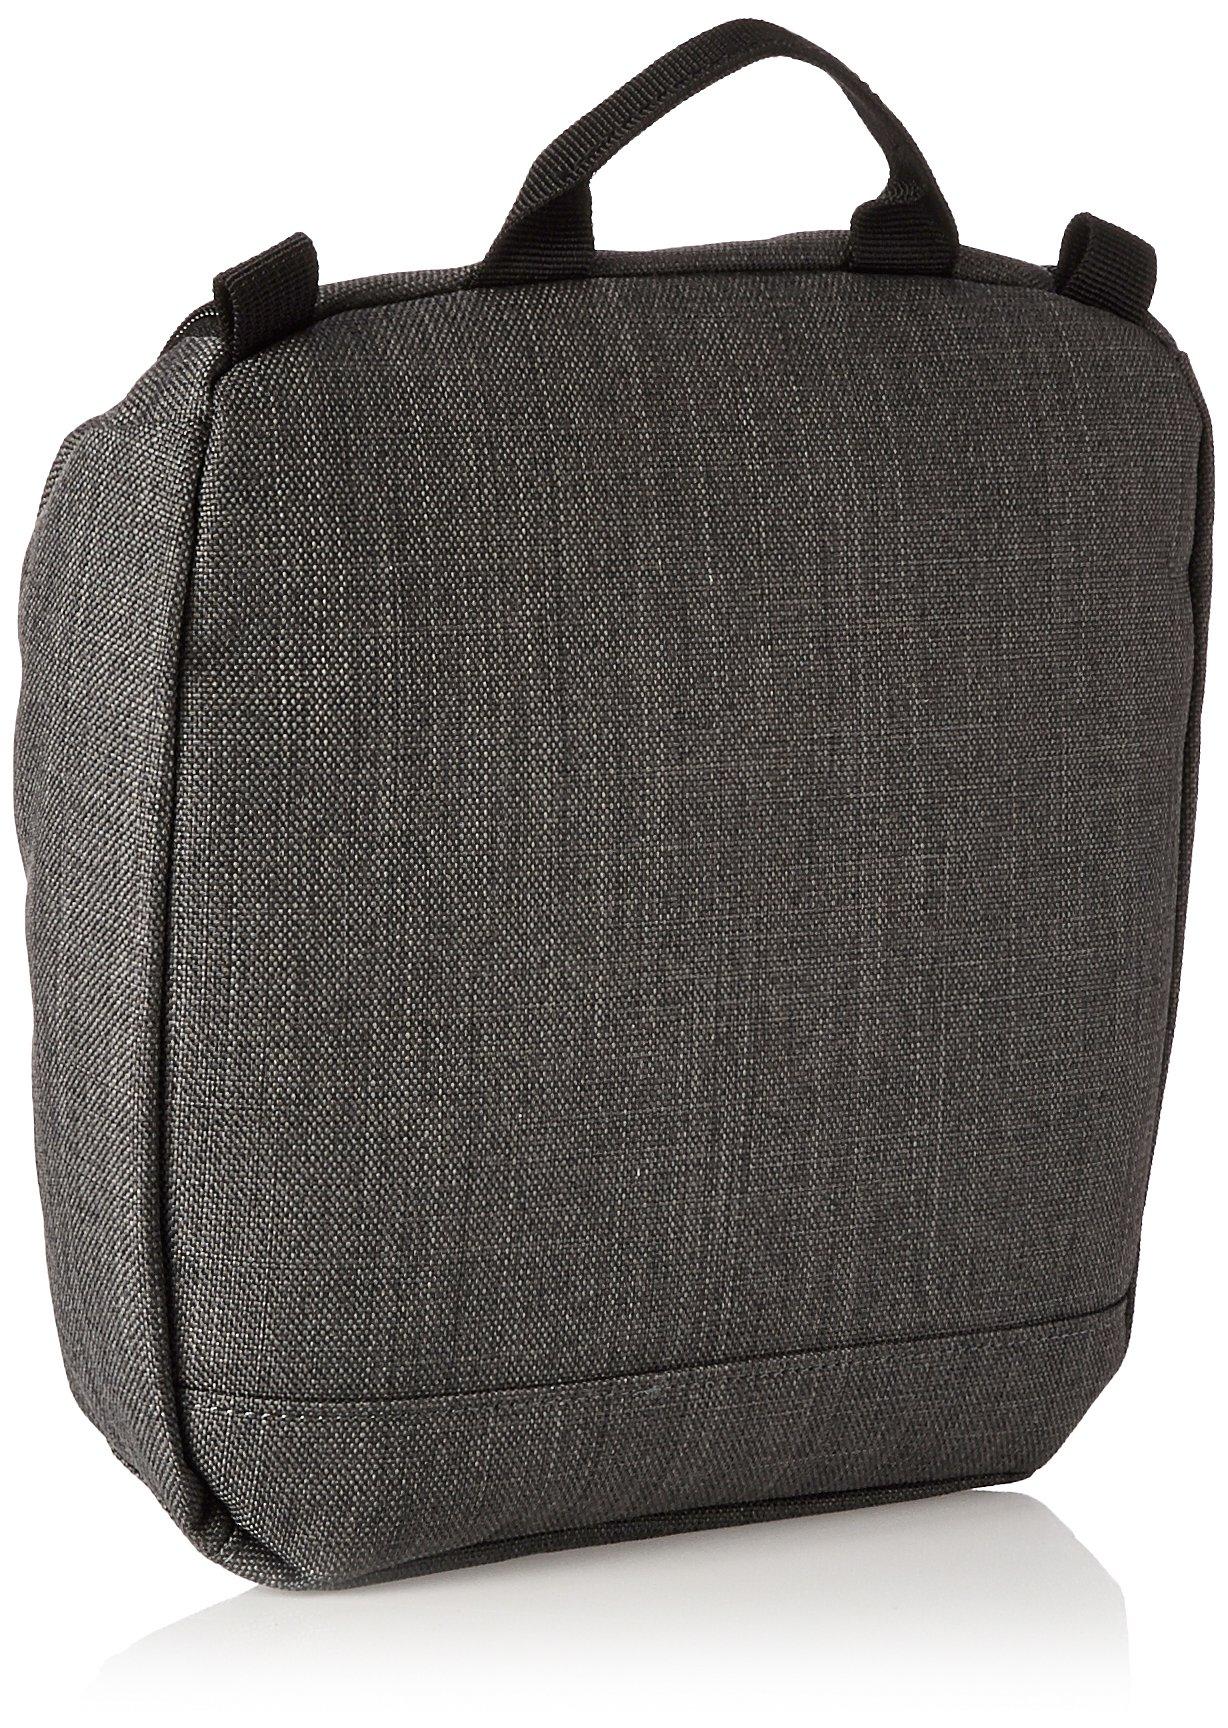 Dakine Travel Kit Toiletry Bag, One Size, Carbon by Dakine (Image #3)